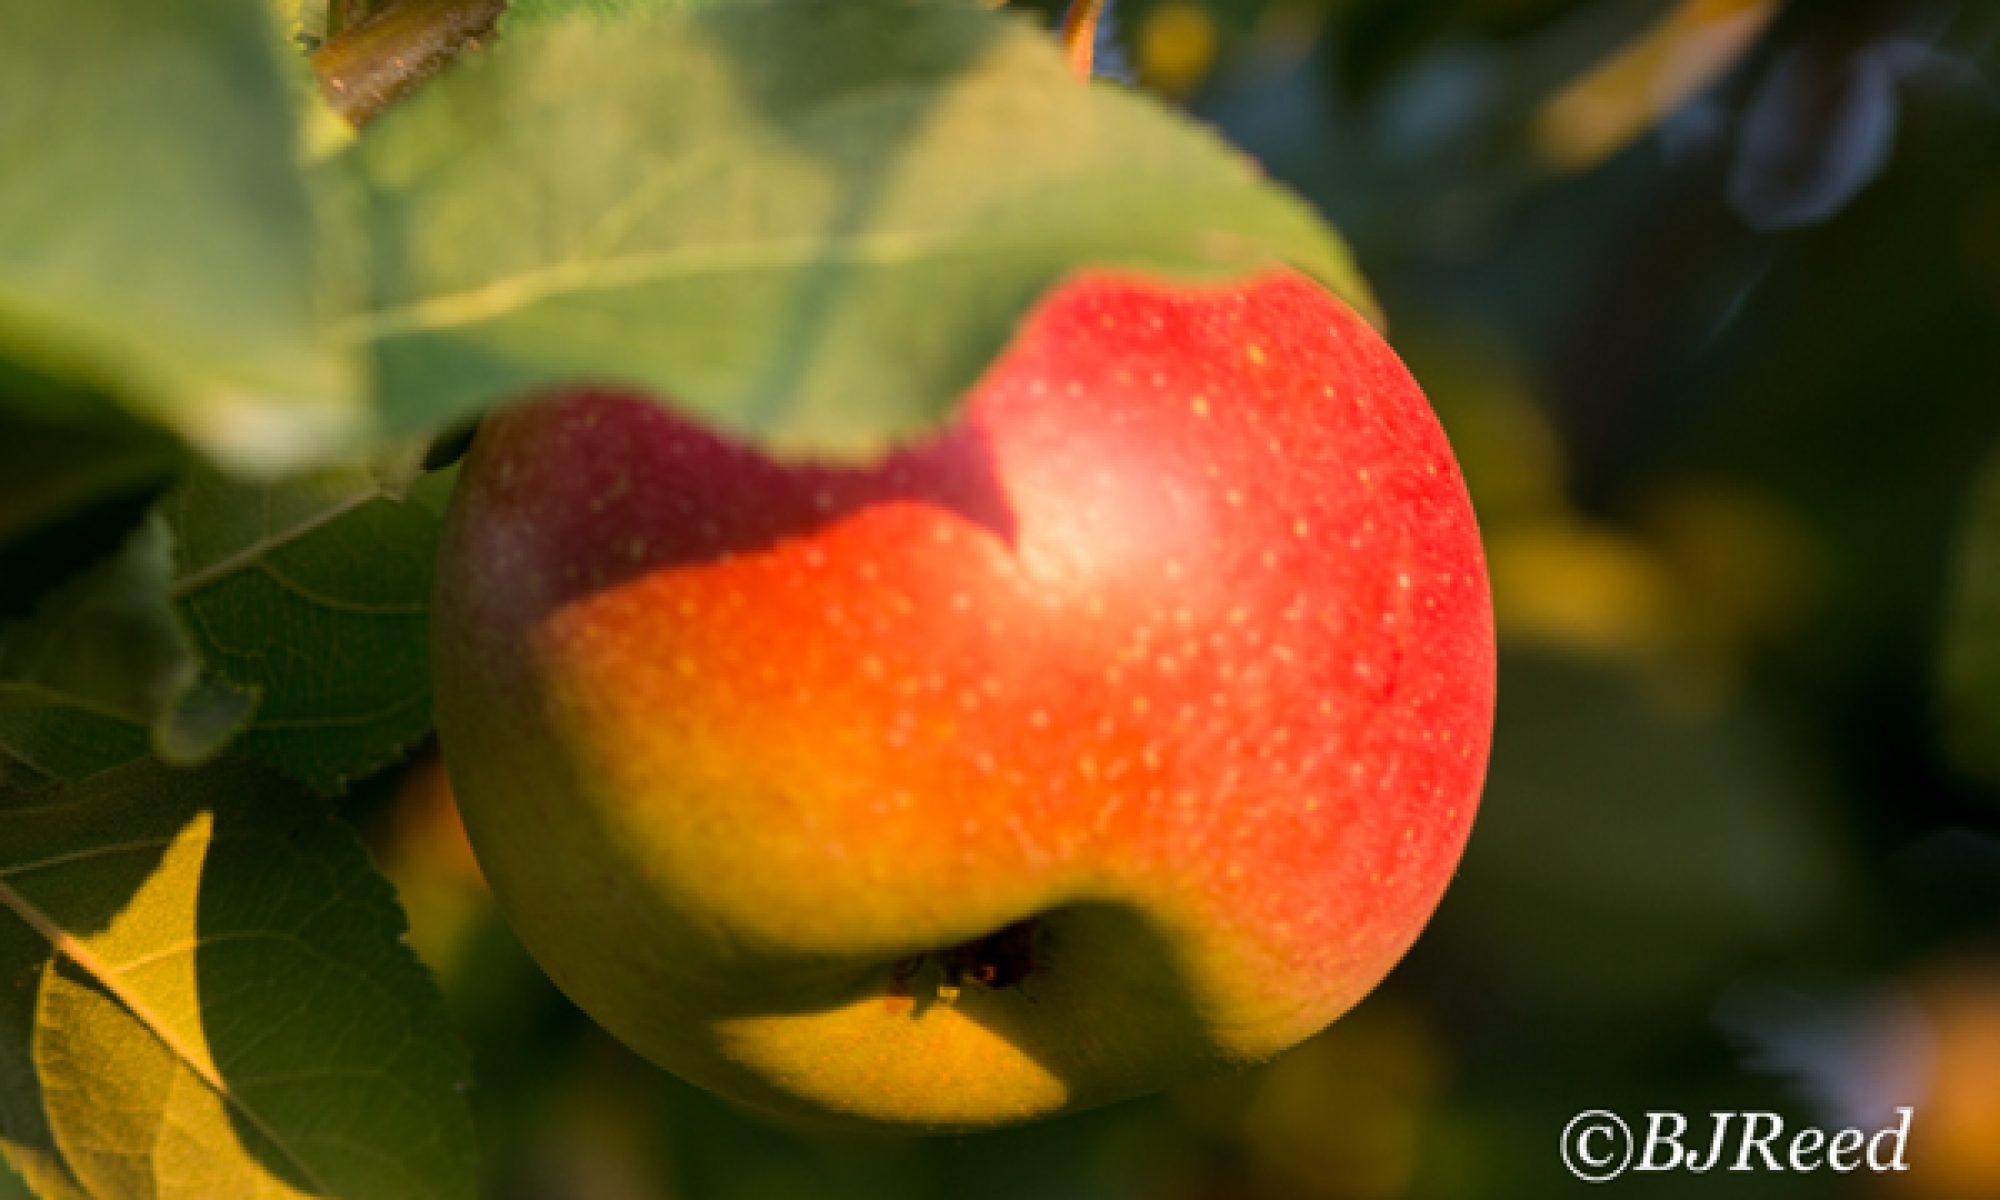 PA Apples